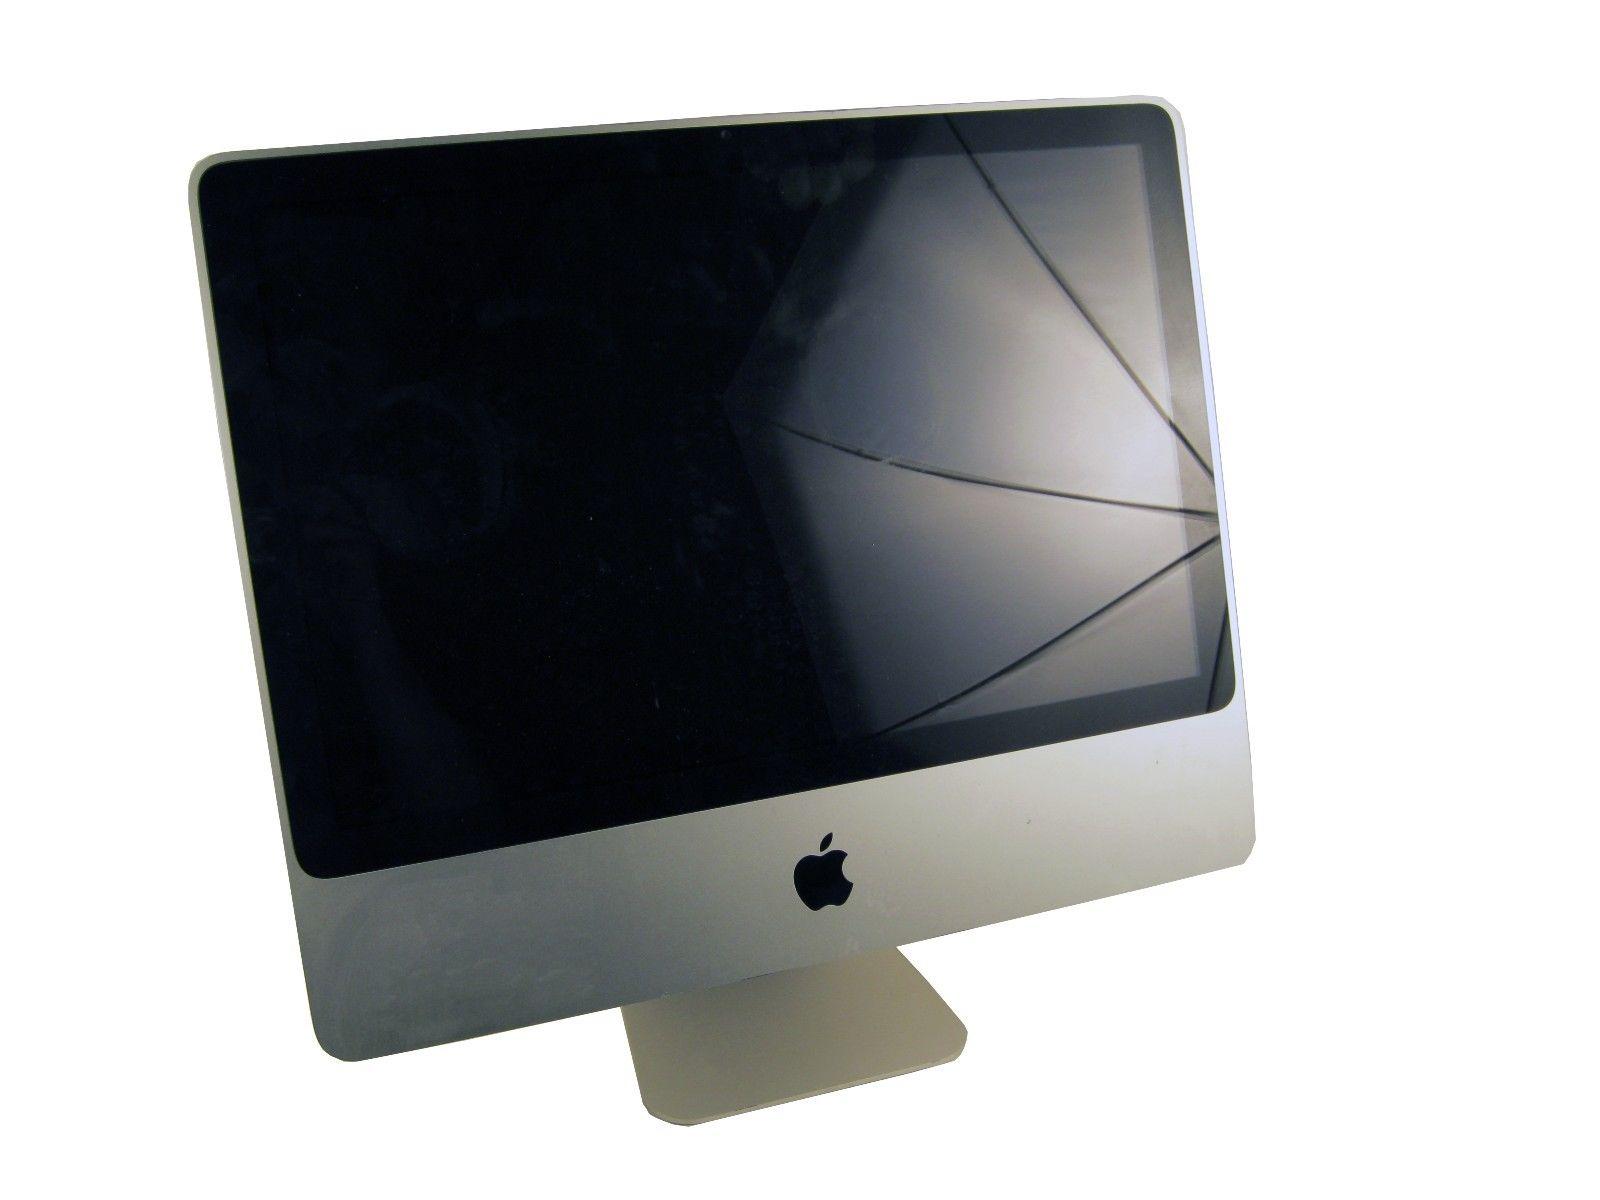 "Apple A1224 iMac 20"" Desktop Intel Core 2 Duo 2GHz 2GB 160GB No OS"